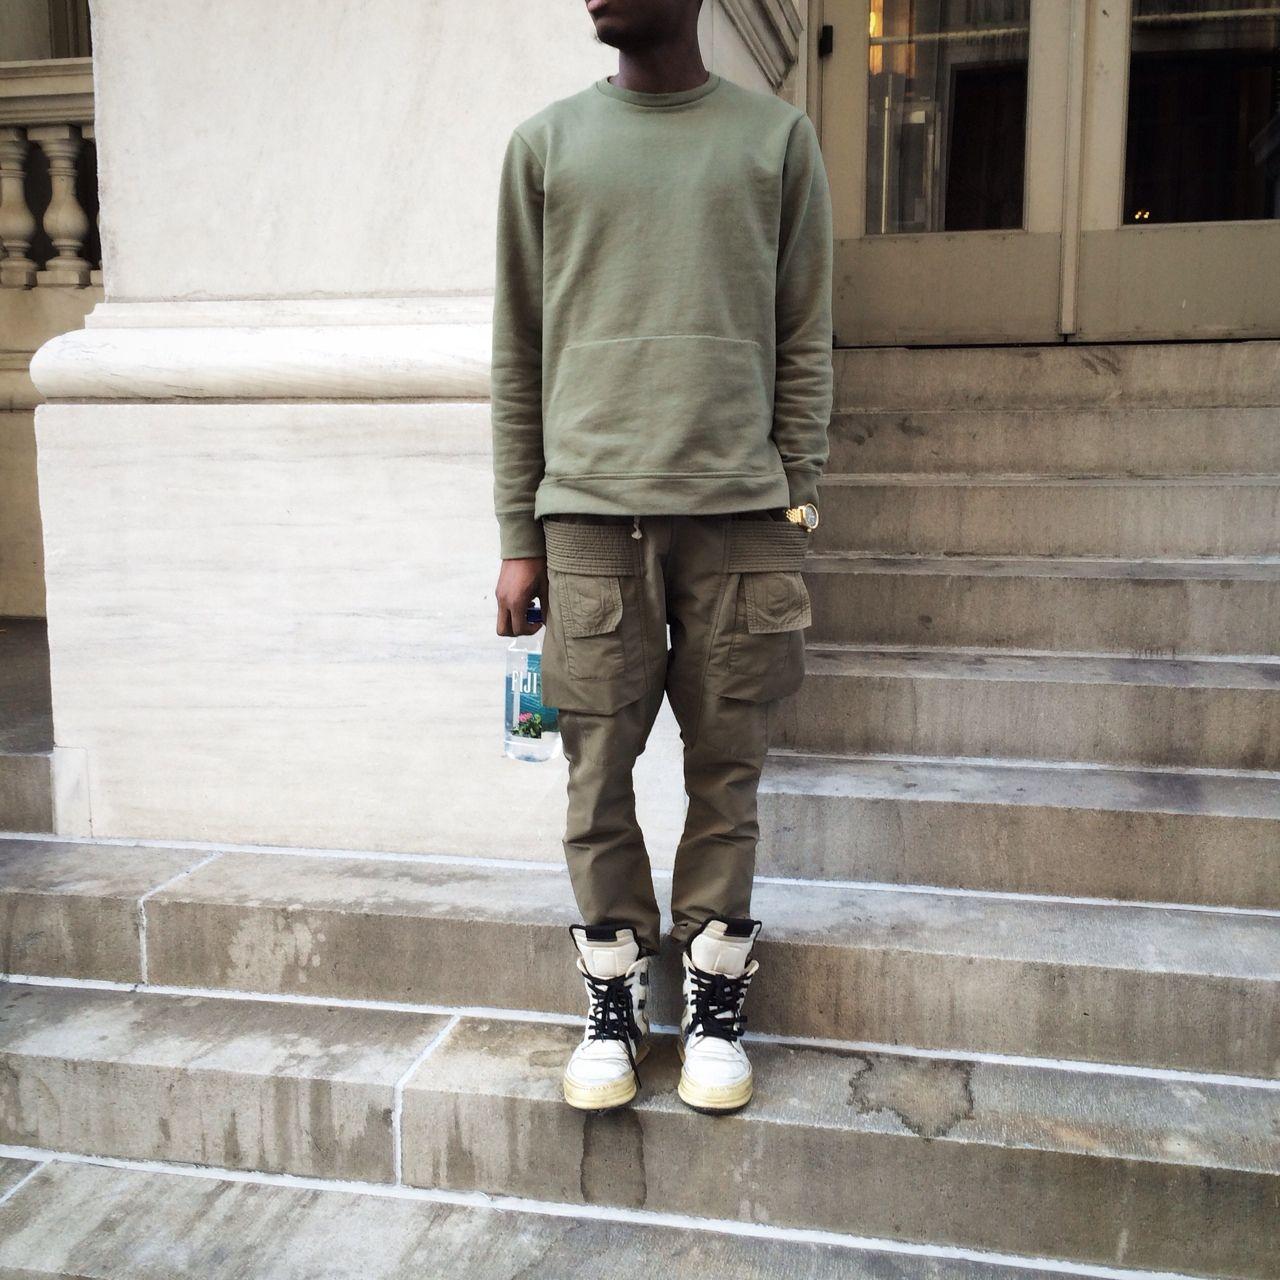 inspo | Minimalism | Streetwear fashion, Fashion, Street wear